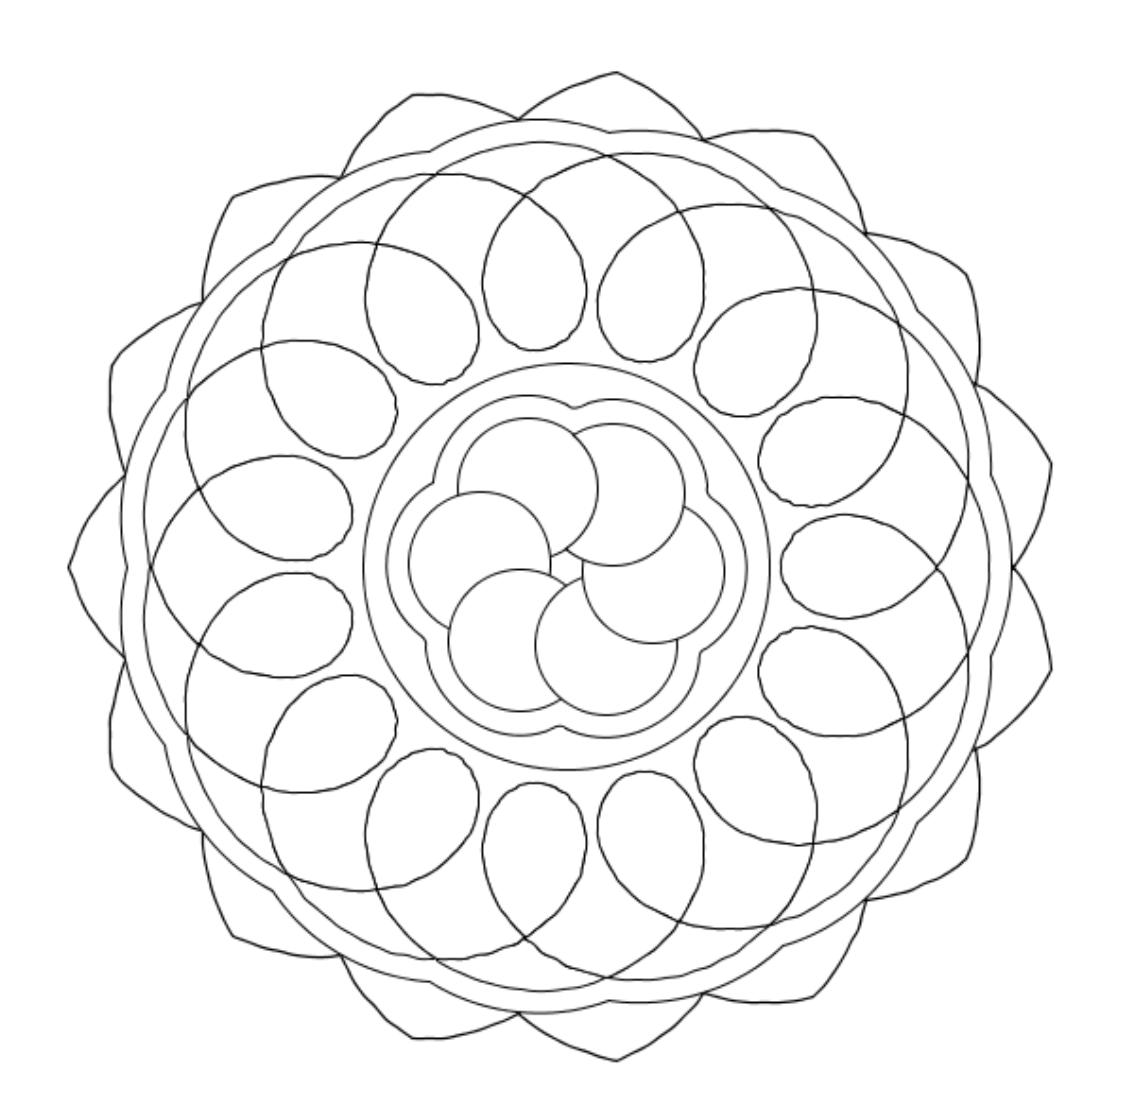 Mandala coloring sheets easy - Easy Mandala Coloring Pages